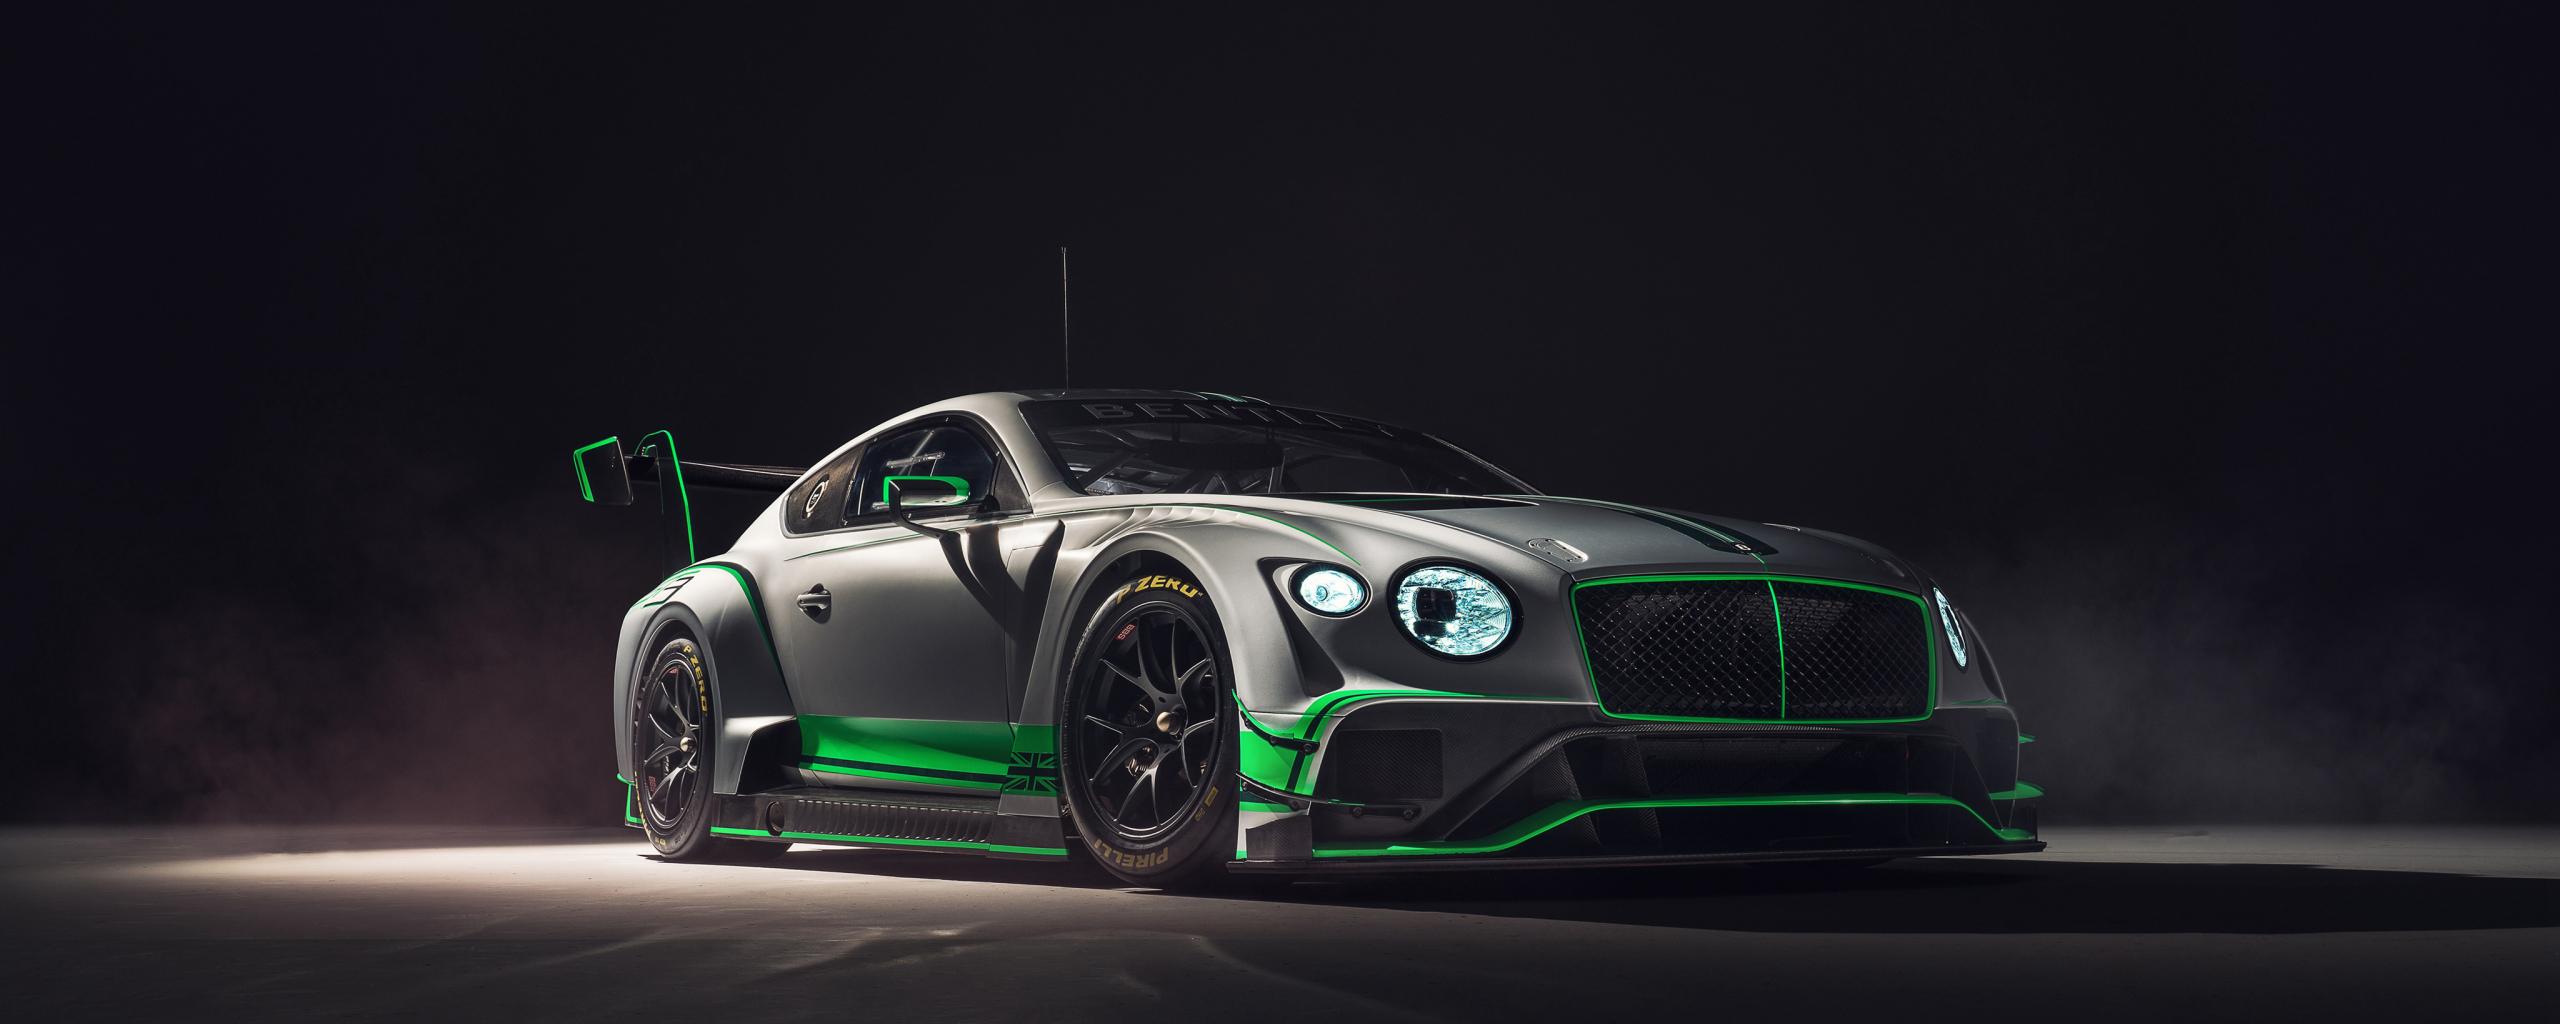 2018 Bentley Continental GT3, 2018 luxury car, 2560x1024 wallpaper